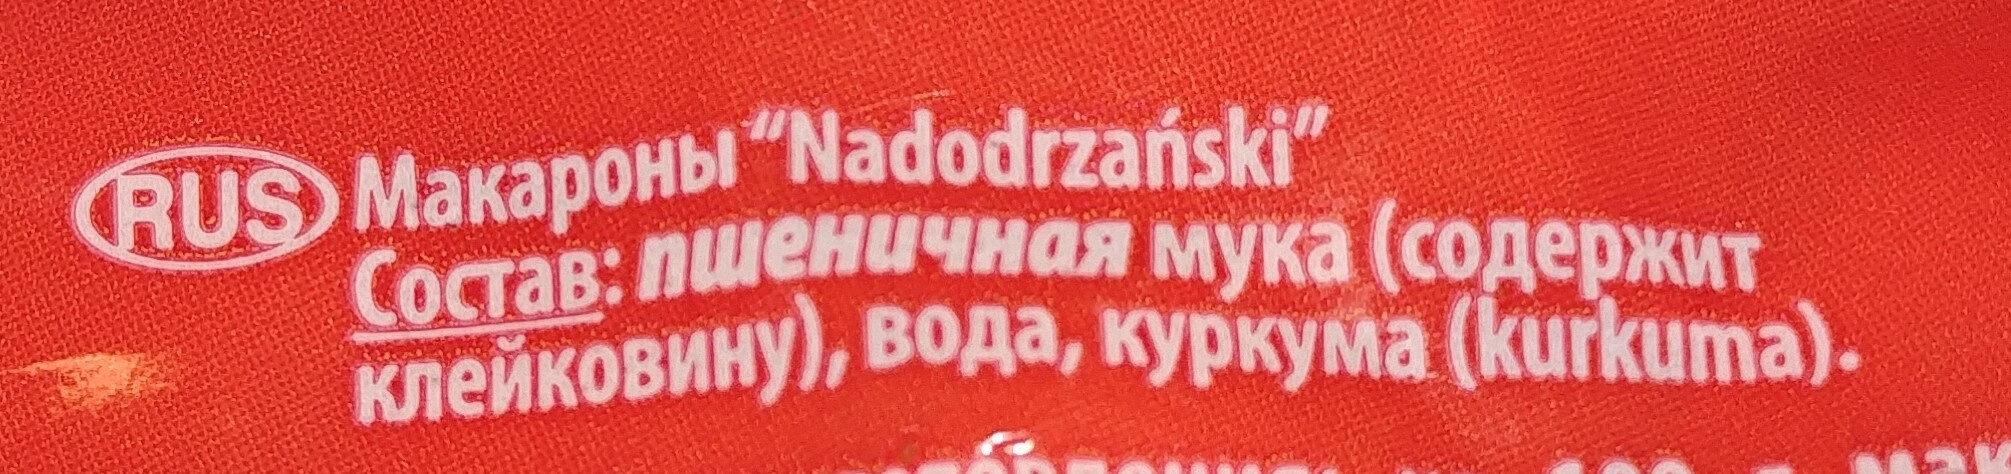 Makaron Nadarzyński - Ингредиенты - ru